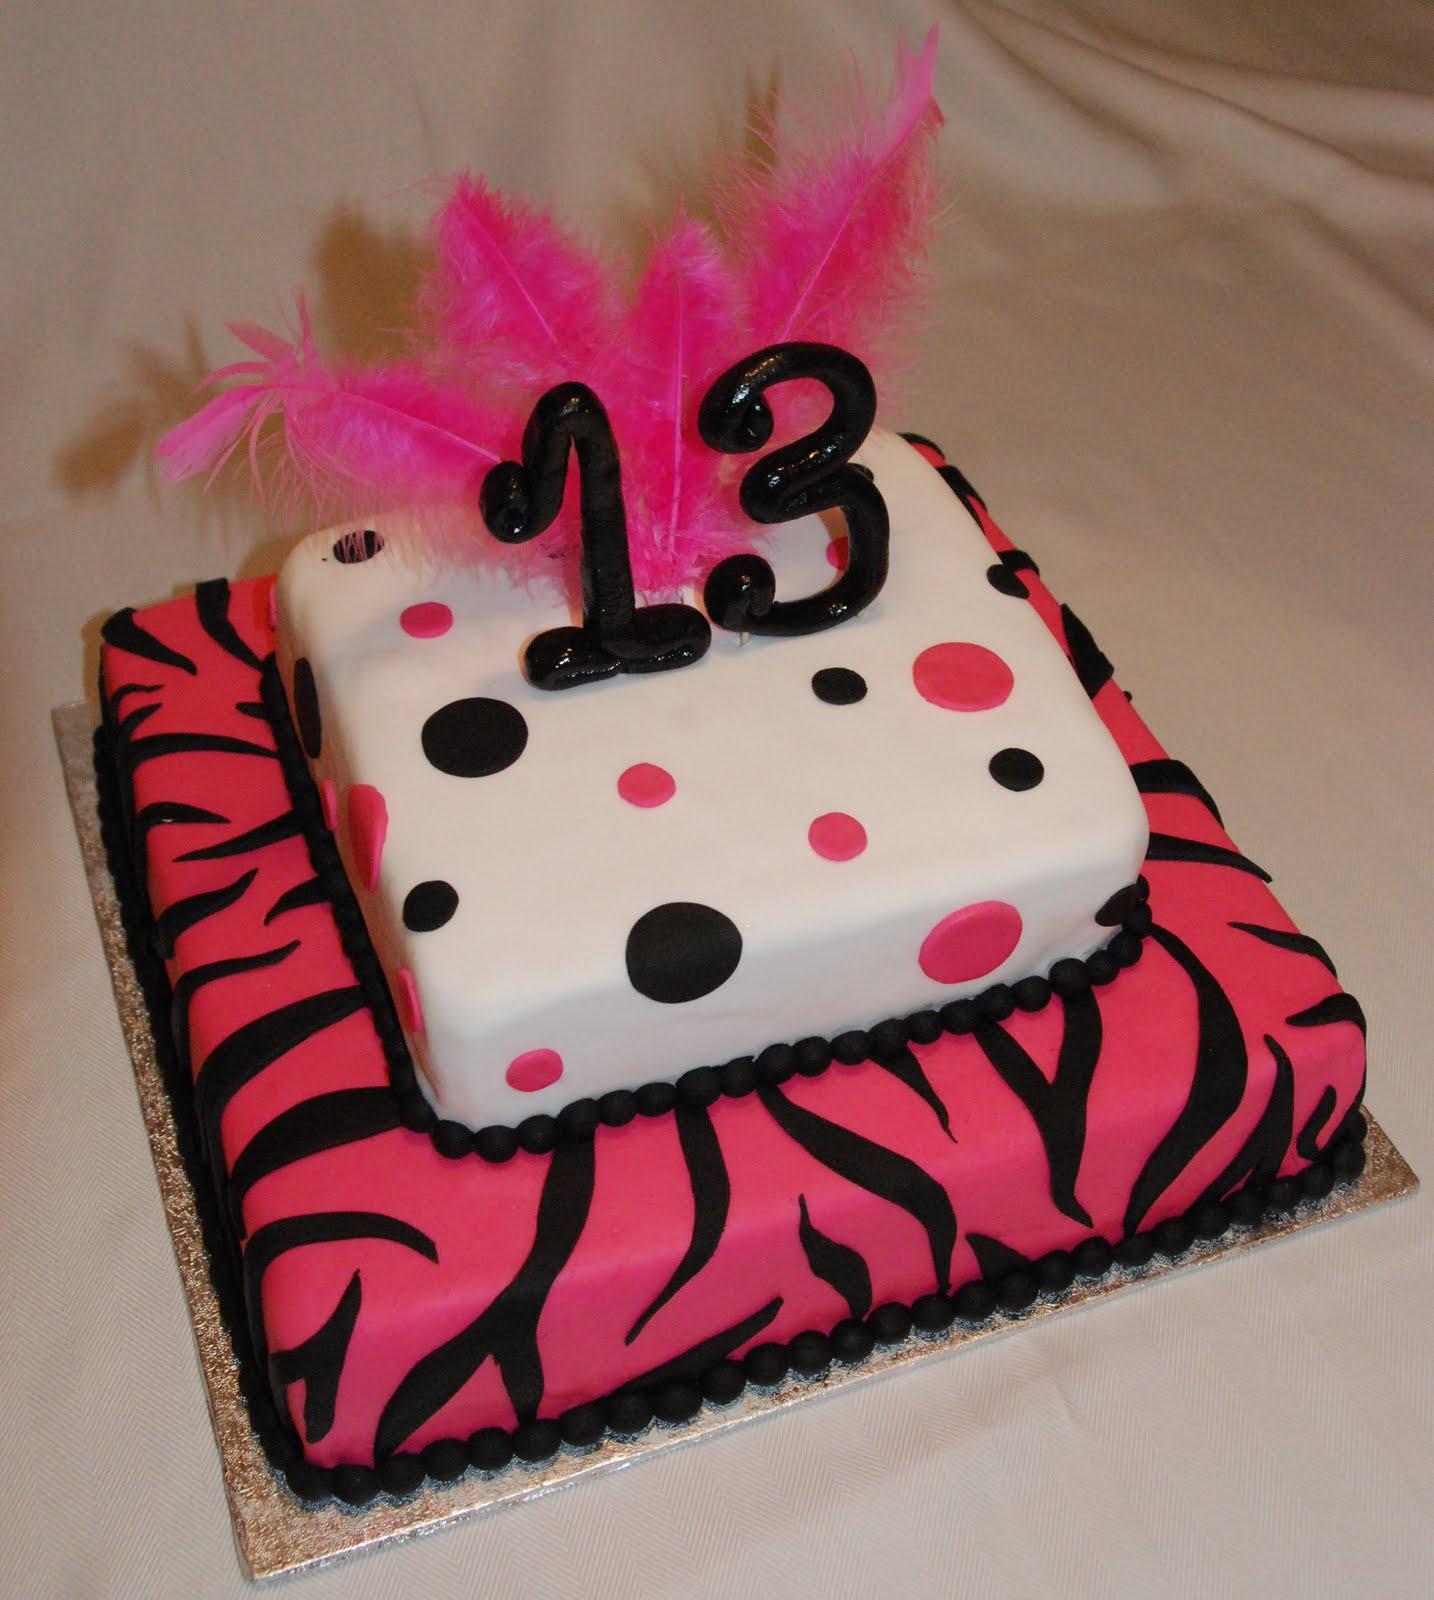 6 Year Girl Birthday Cake Ideas Birthday Cakes for Girl